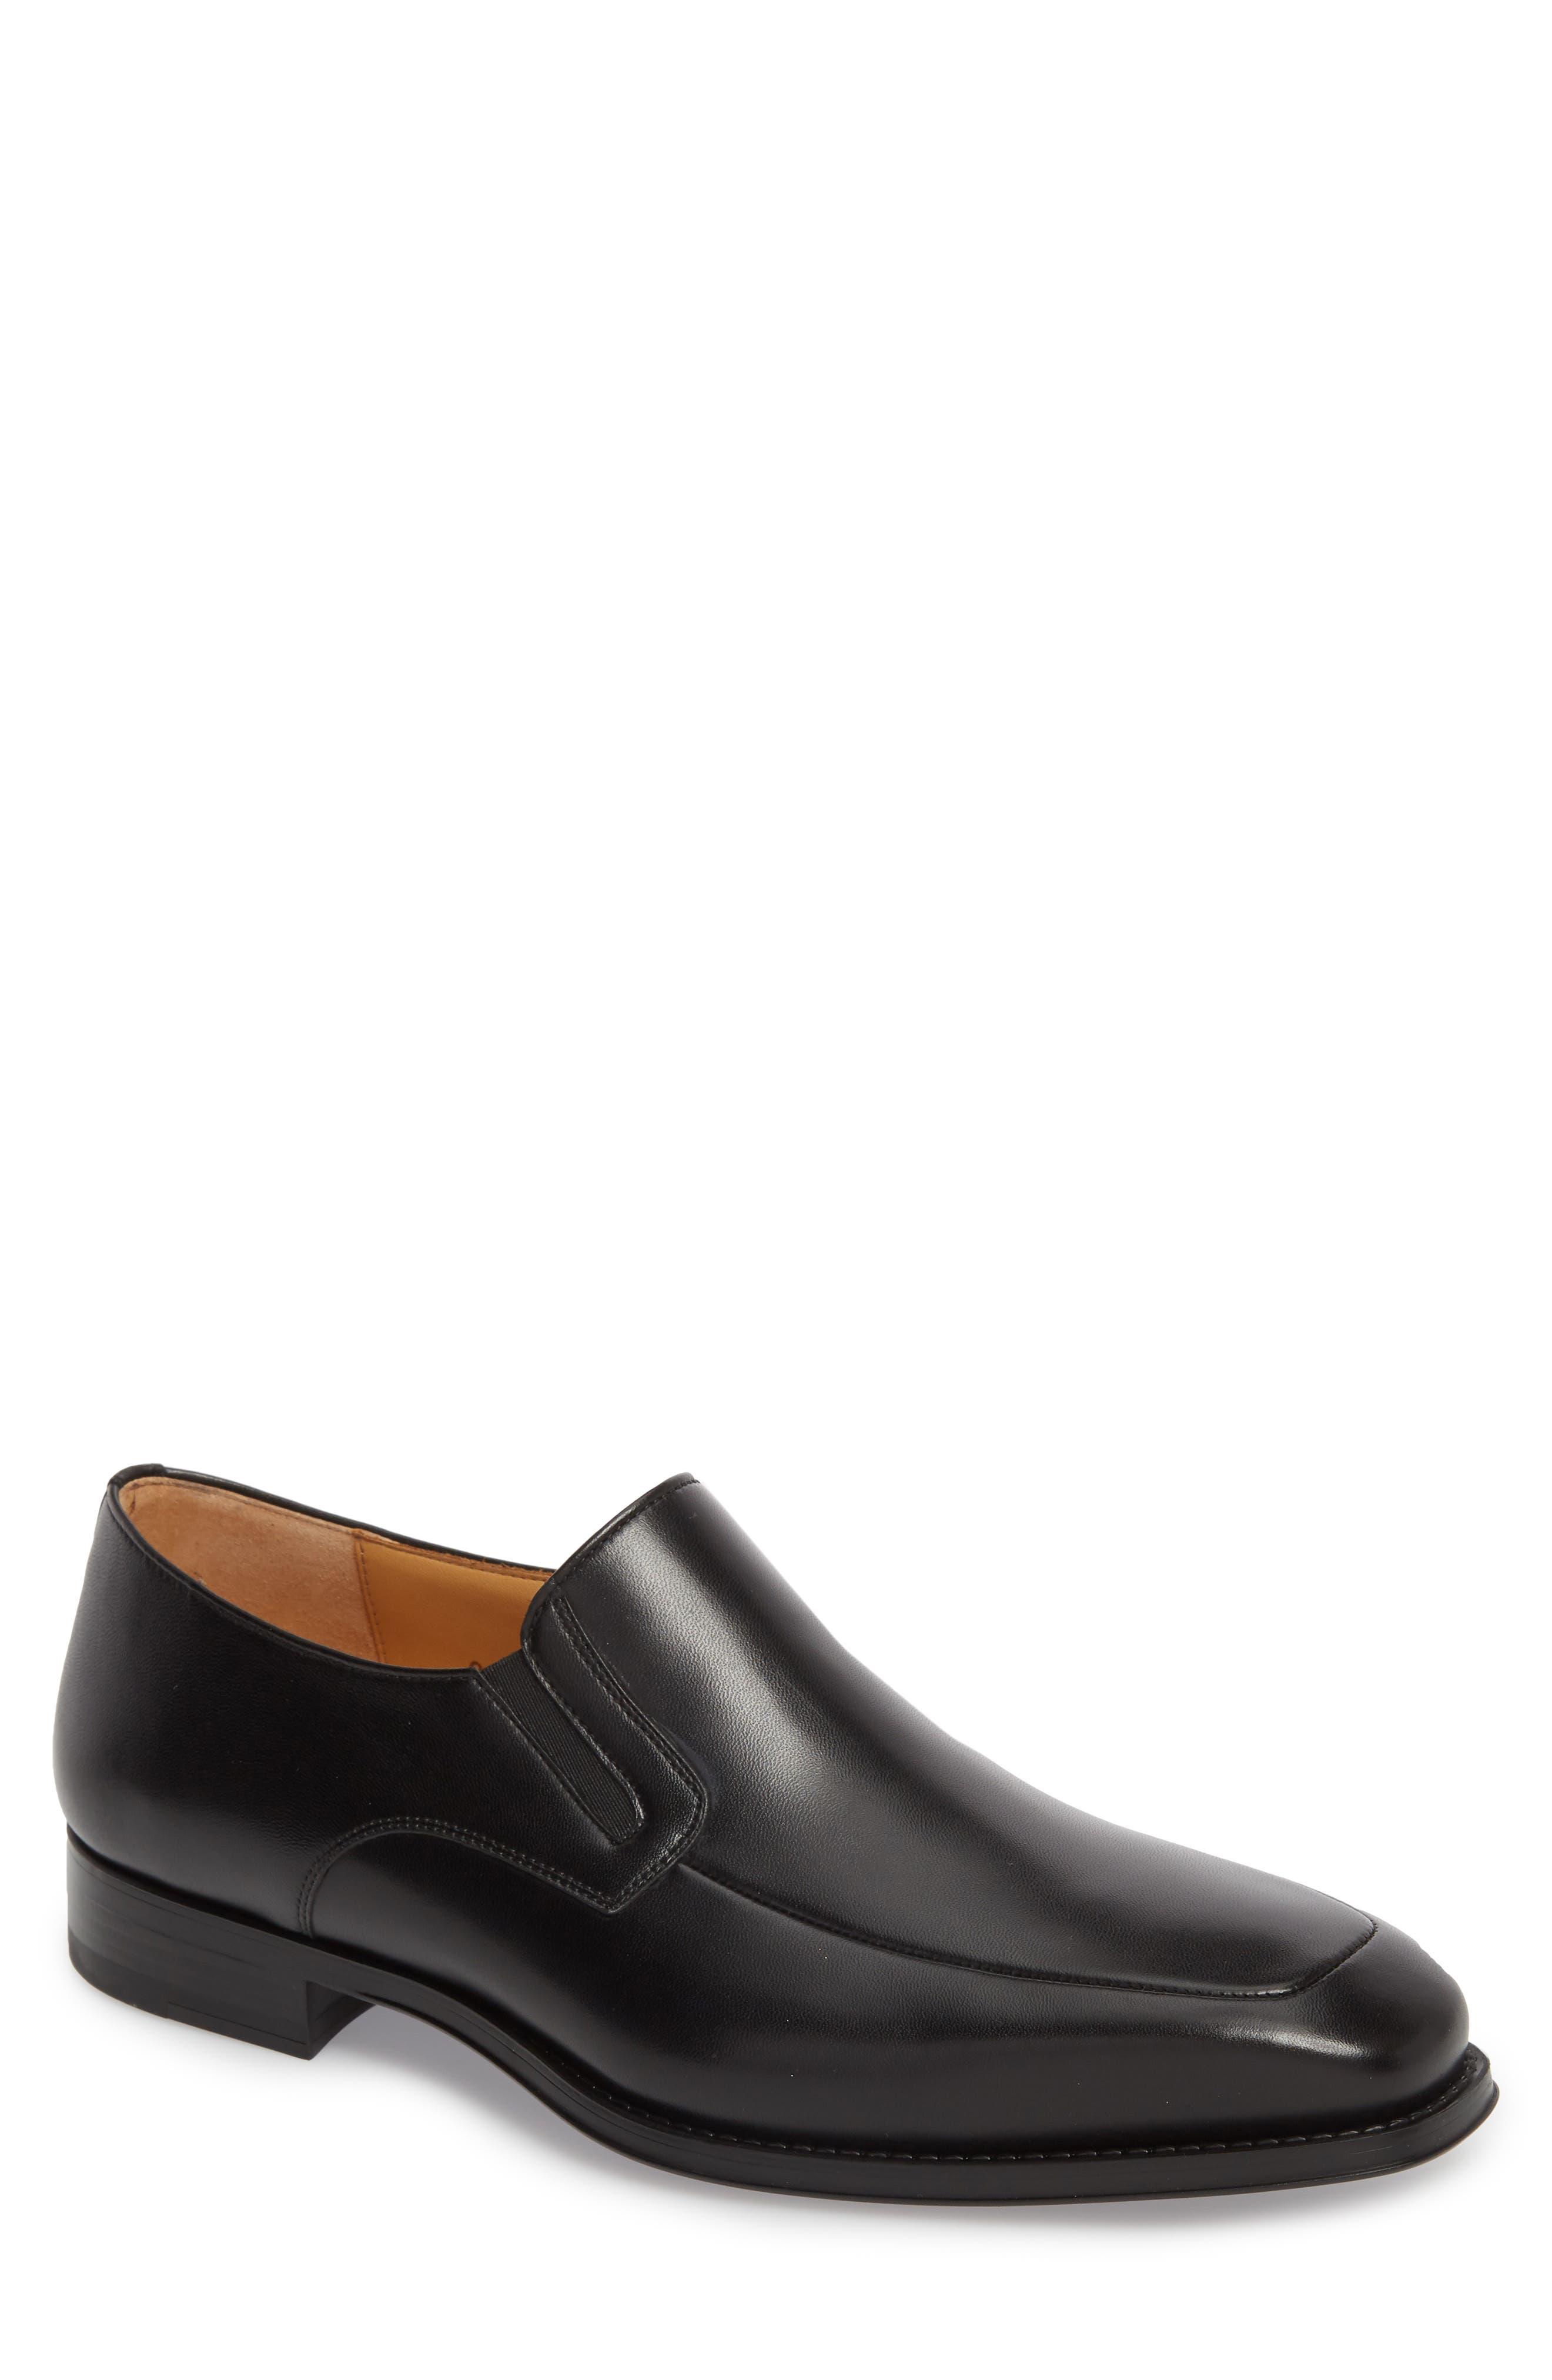 Fabricio Apron Toe Slip-On,                         Main,                         color, Black Leather